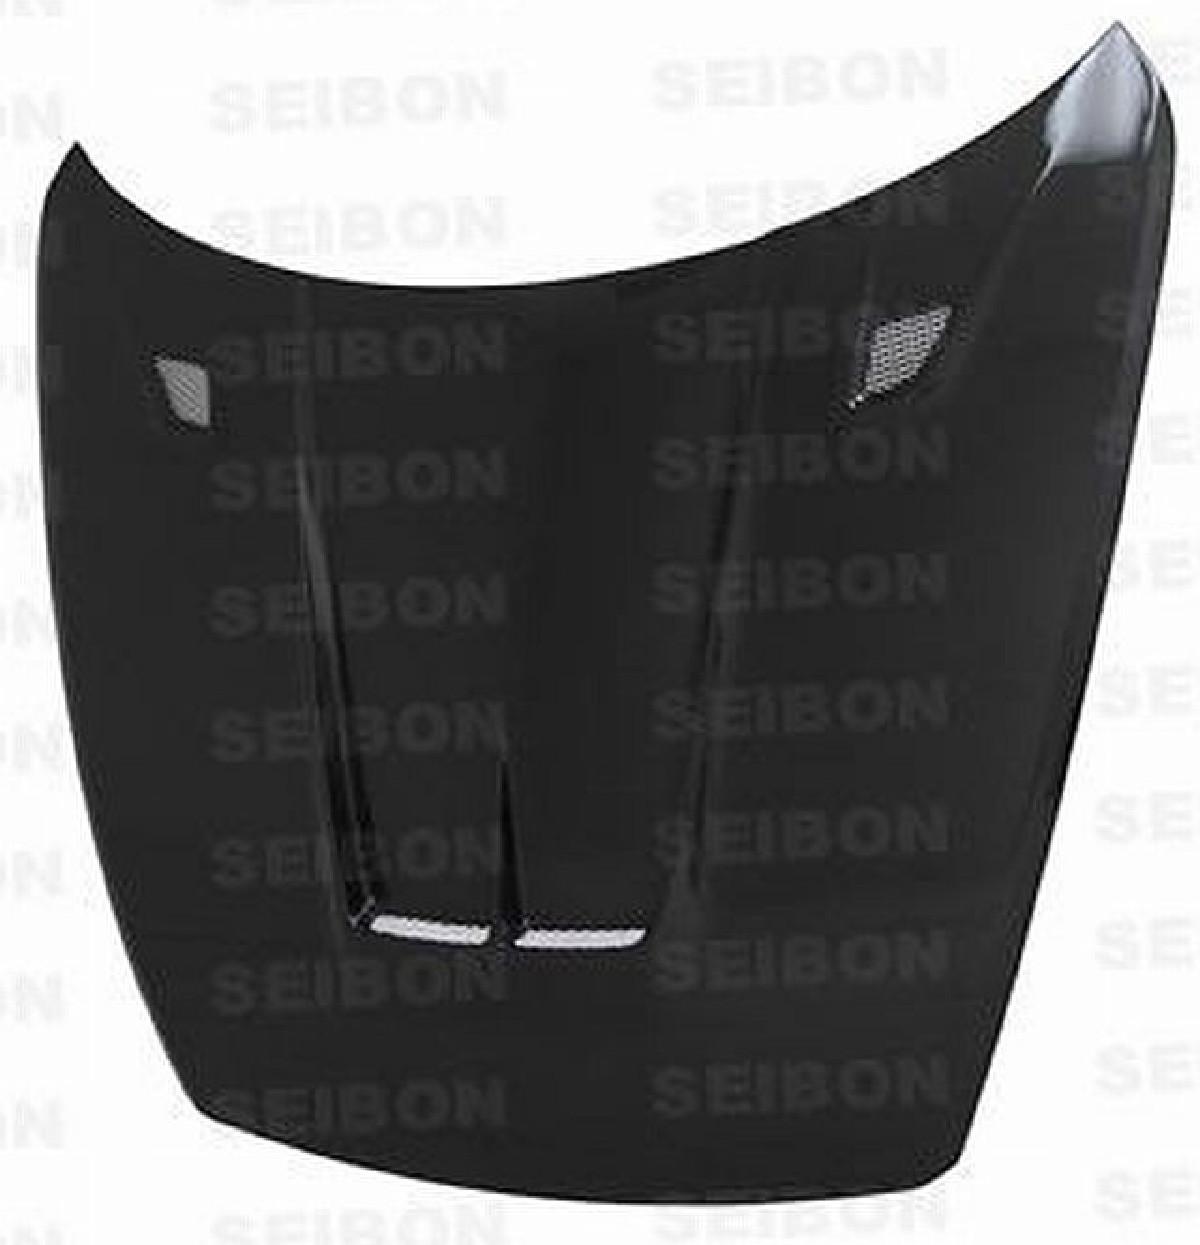 Seibon TT Carbon Motorhaube Mazda RX8 04-08